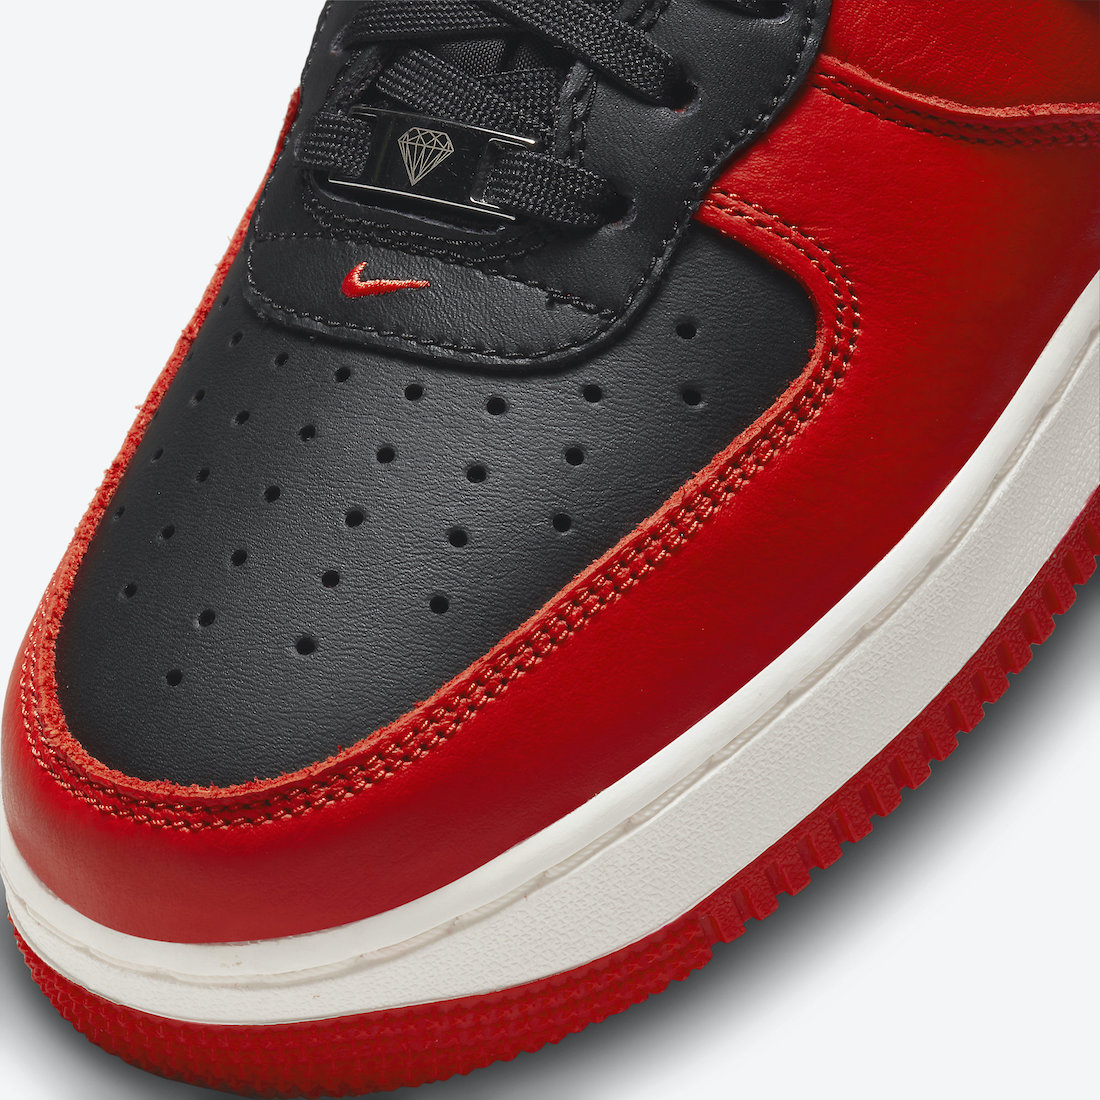 Nike Air Force 1 High, Nike Air Force 1, Nike Air, NIKE, HYPER ROYAL, HIGH, FORCE 1, Air Force 1